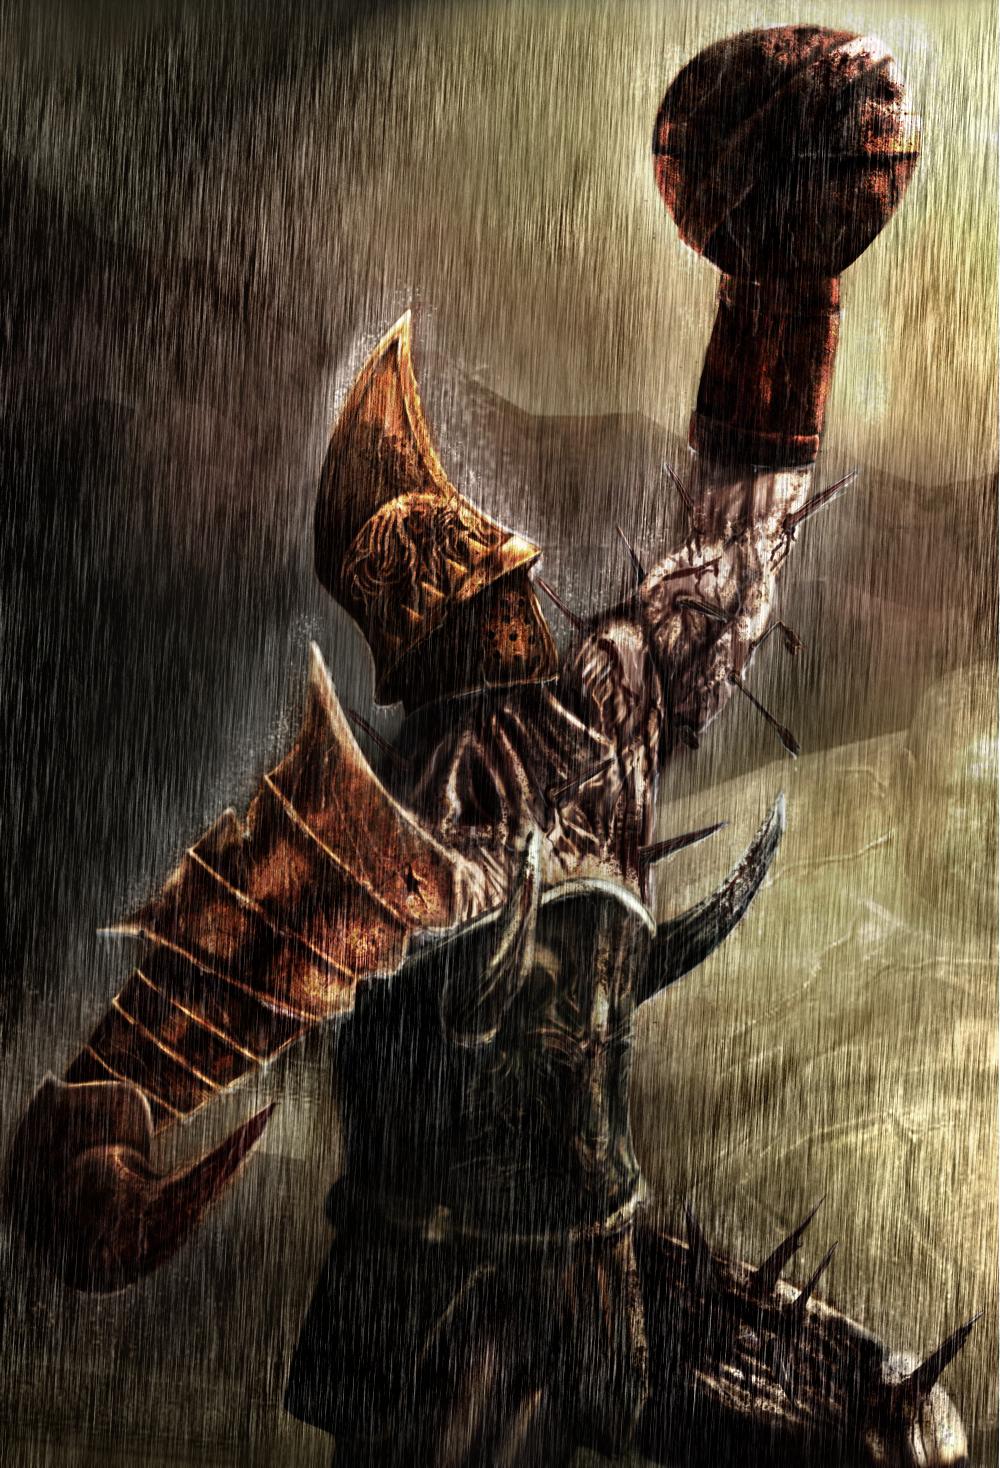 http://fc08.deviantart.net/fs43/f/2009/070/3/2/Jericho__s_Gladiator___Victory_by_hcf_albert_wesker.jpg